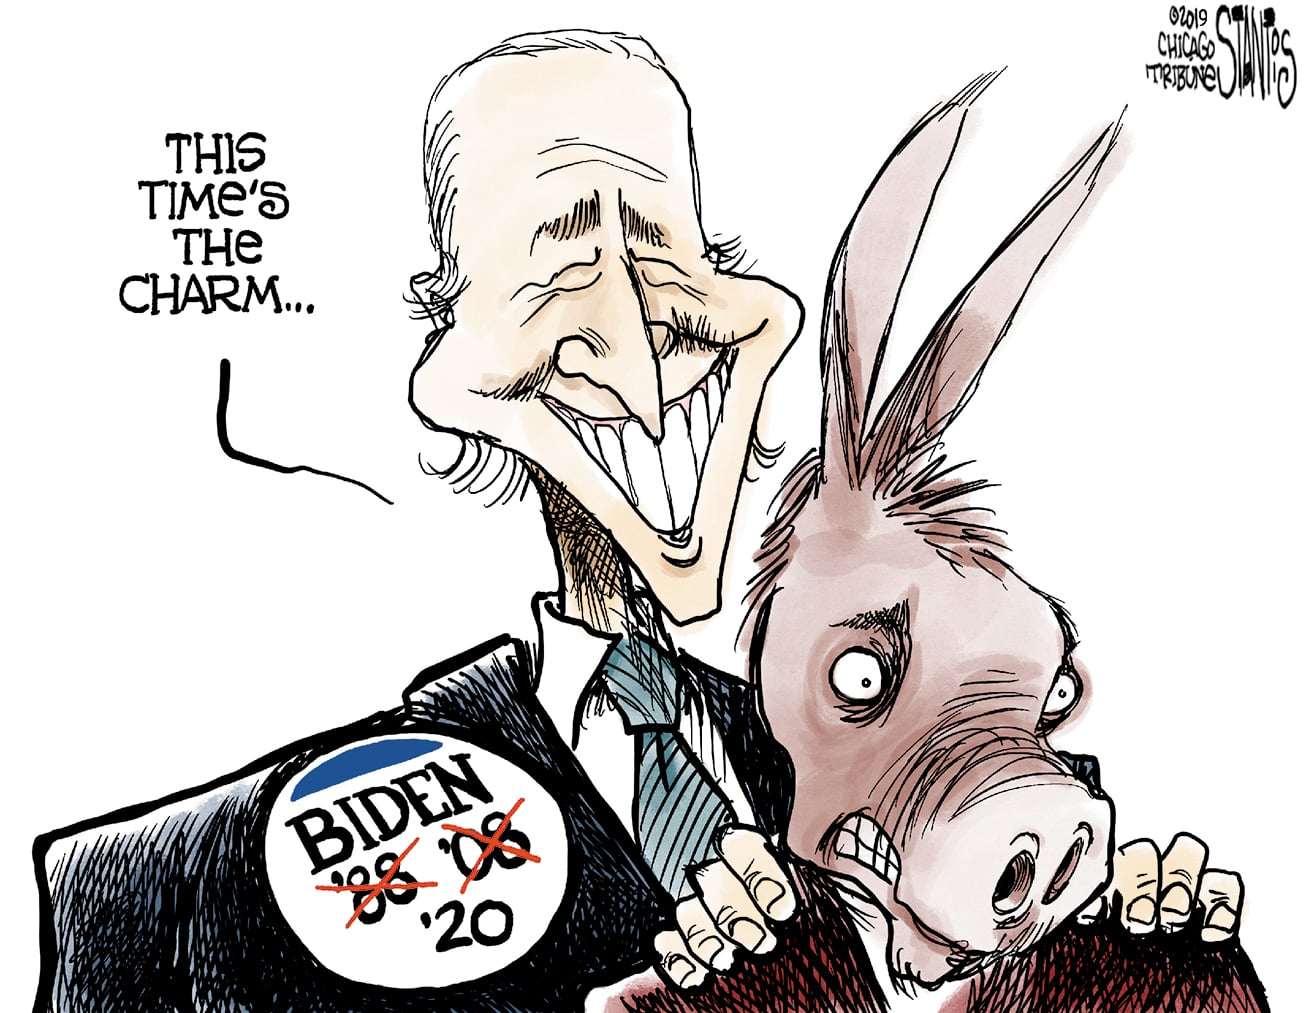 April 27: Biden 2020